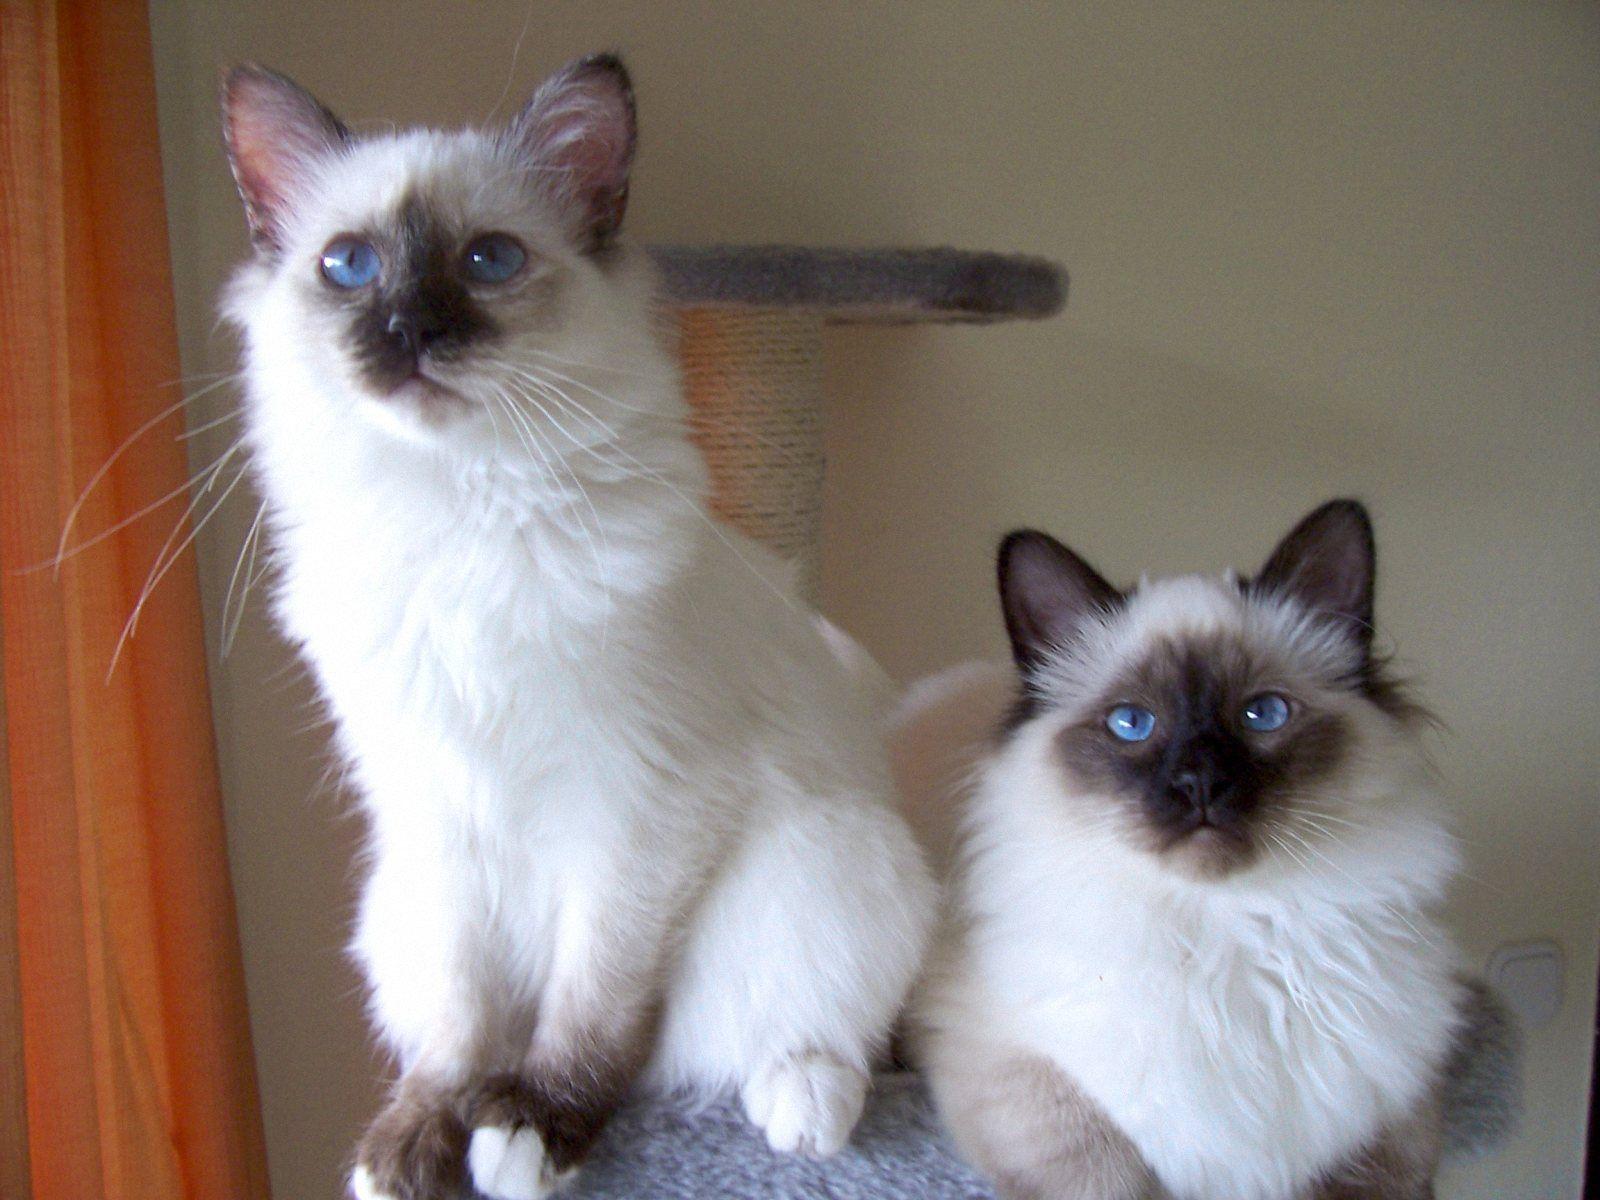 TWO BIRMAN CATS WALLPAPERS Birman cat